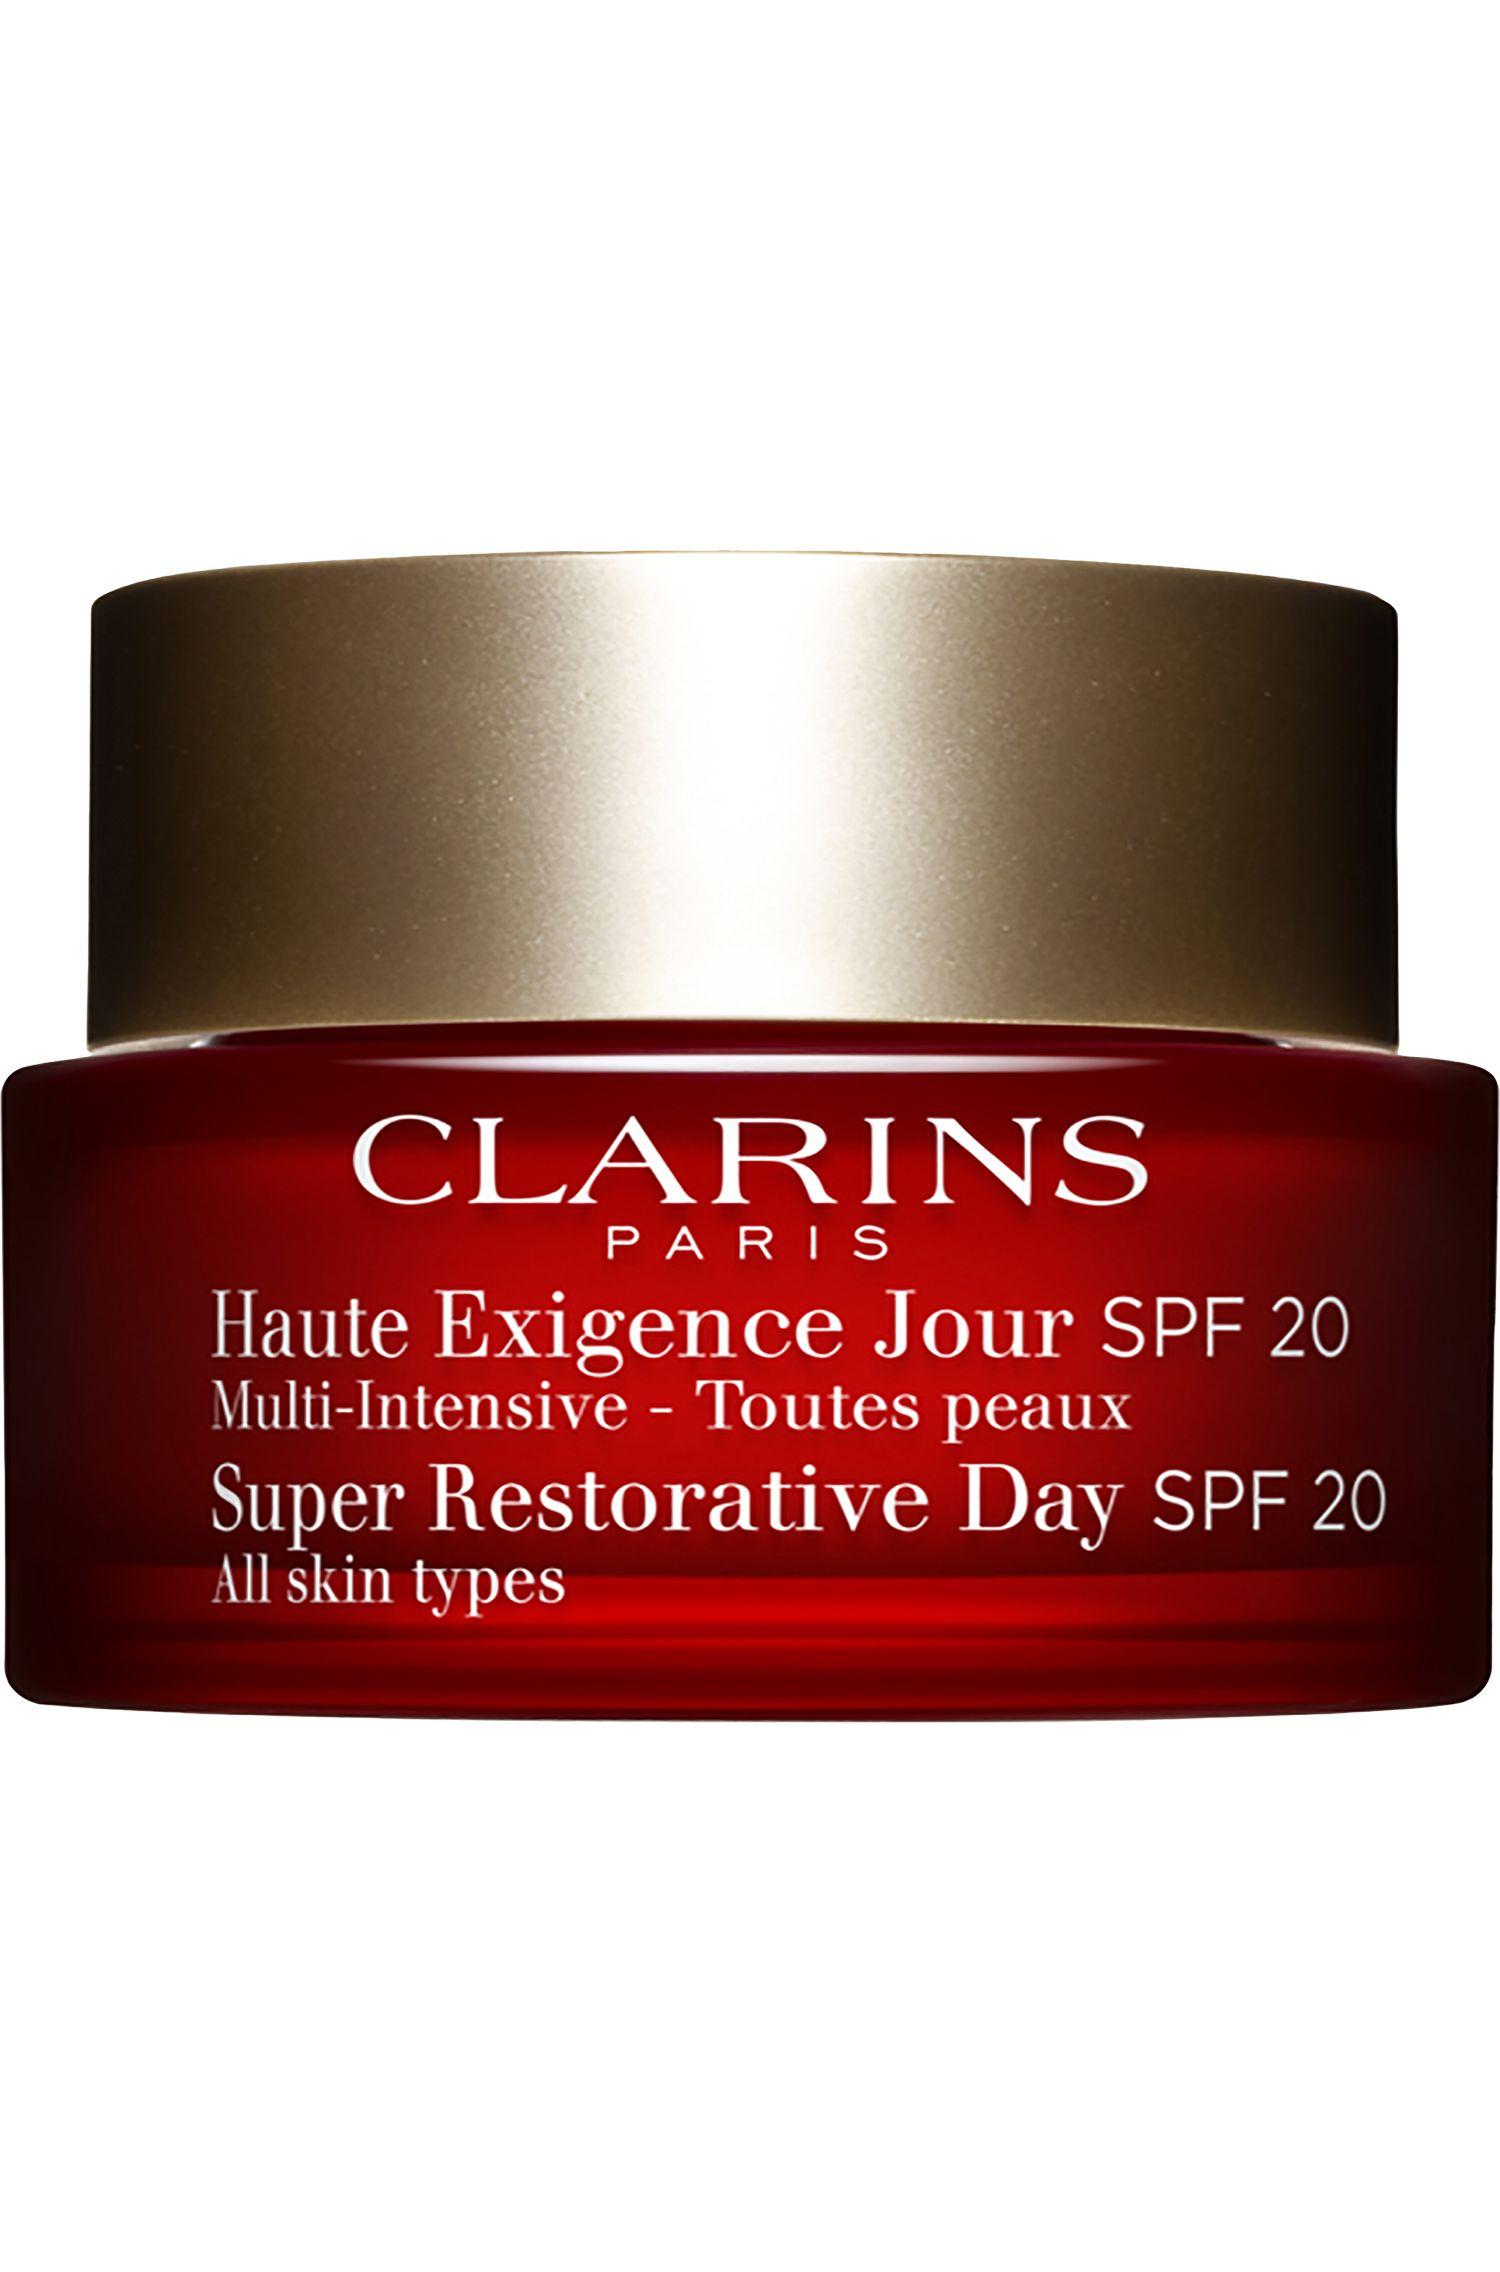 Blissim : Clarins - Crème jour lift redensifiante illuminatrice SPF20 Multi-Intensive - Crème jour lift redensifiante illuminatrice SPF20 Multi-Intensive